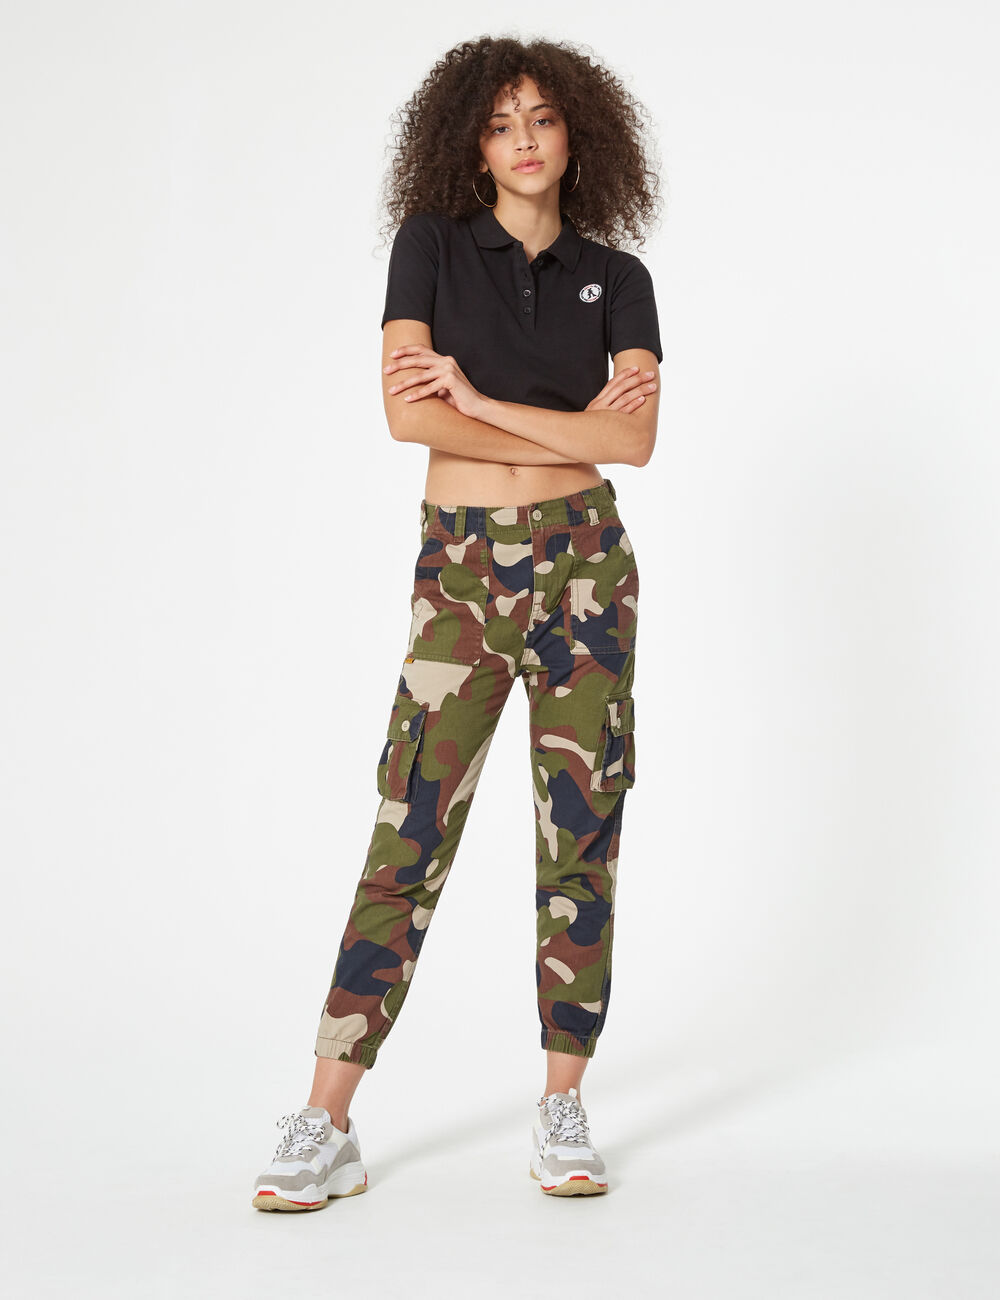 Pantalon Pantalon Camouflage Camouflage Kaki Cargo Kaki Pantalon Cargo Camouflage Cargo Cargo Pantalon Kaki Camouflage vmN8w0nO